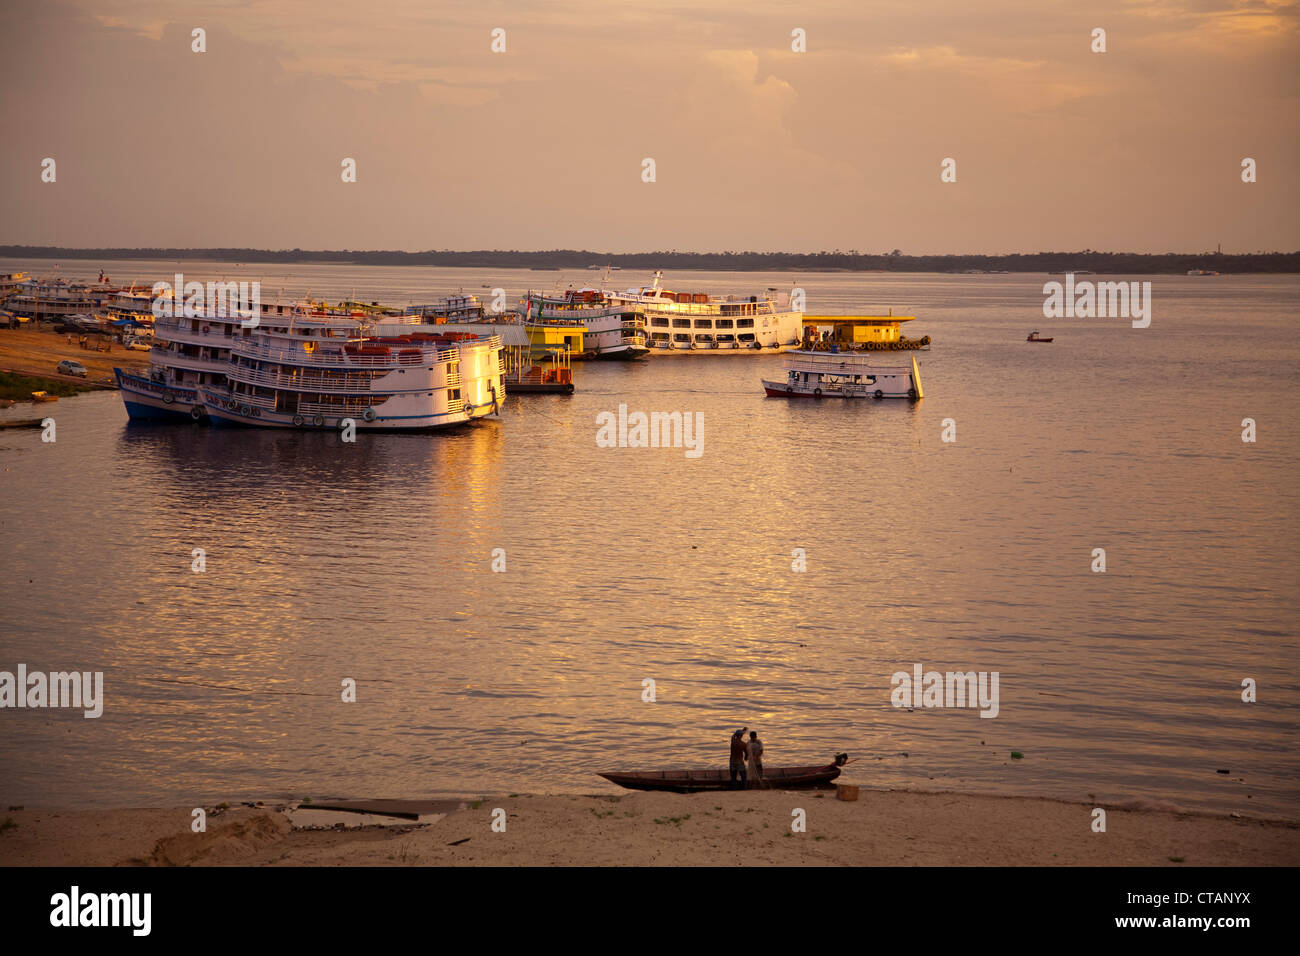 Fishermen in canoe and Amazon river boats at sunset, Manaus, Amazonas, Brazil, South America - Stock Image